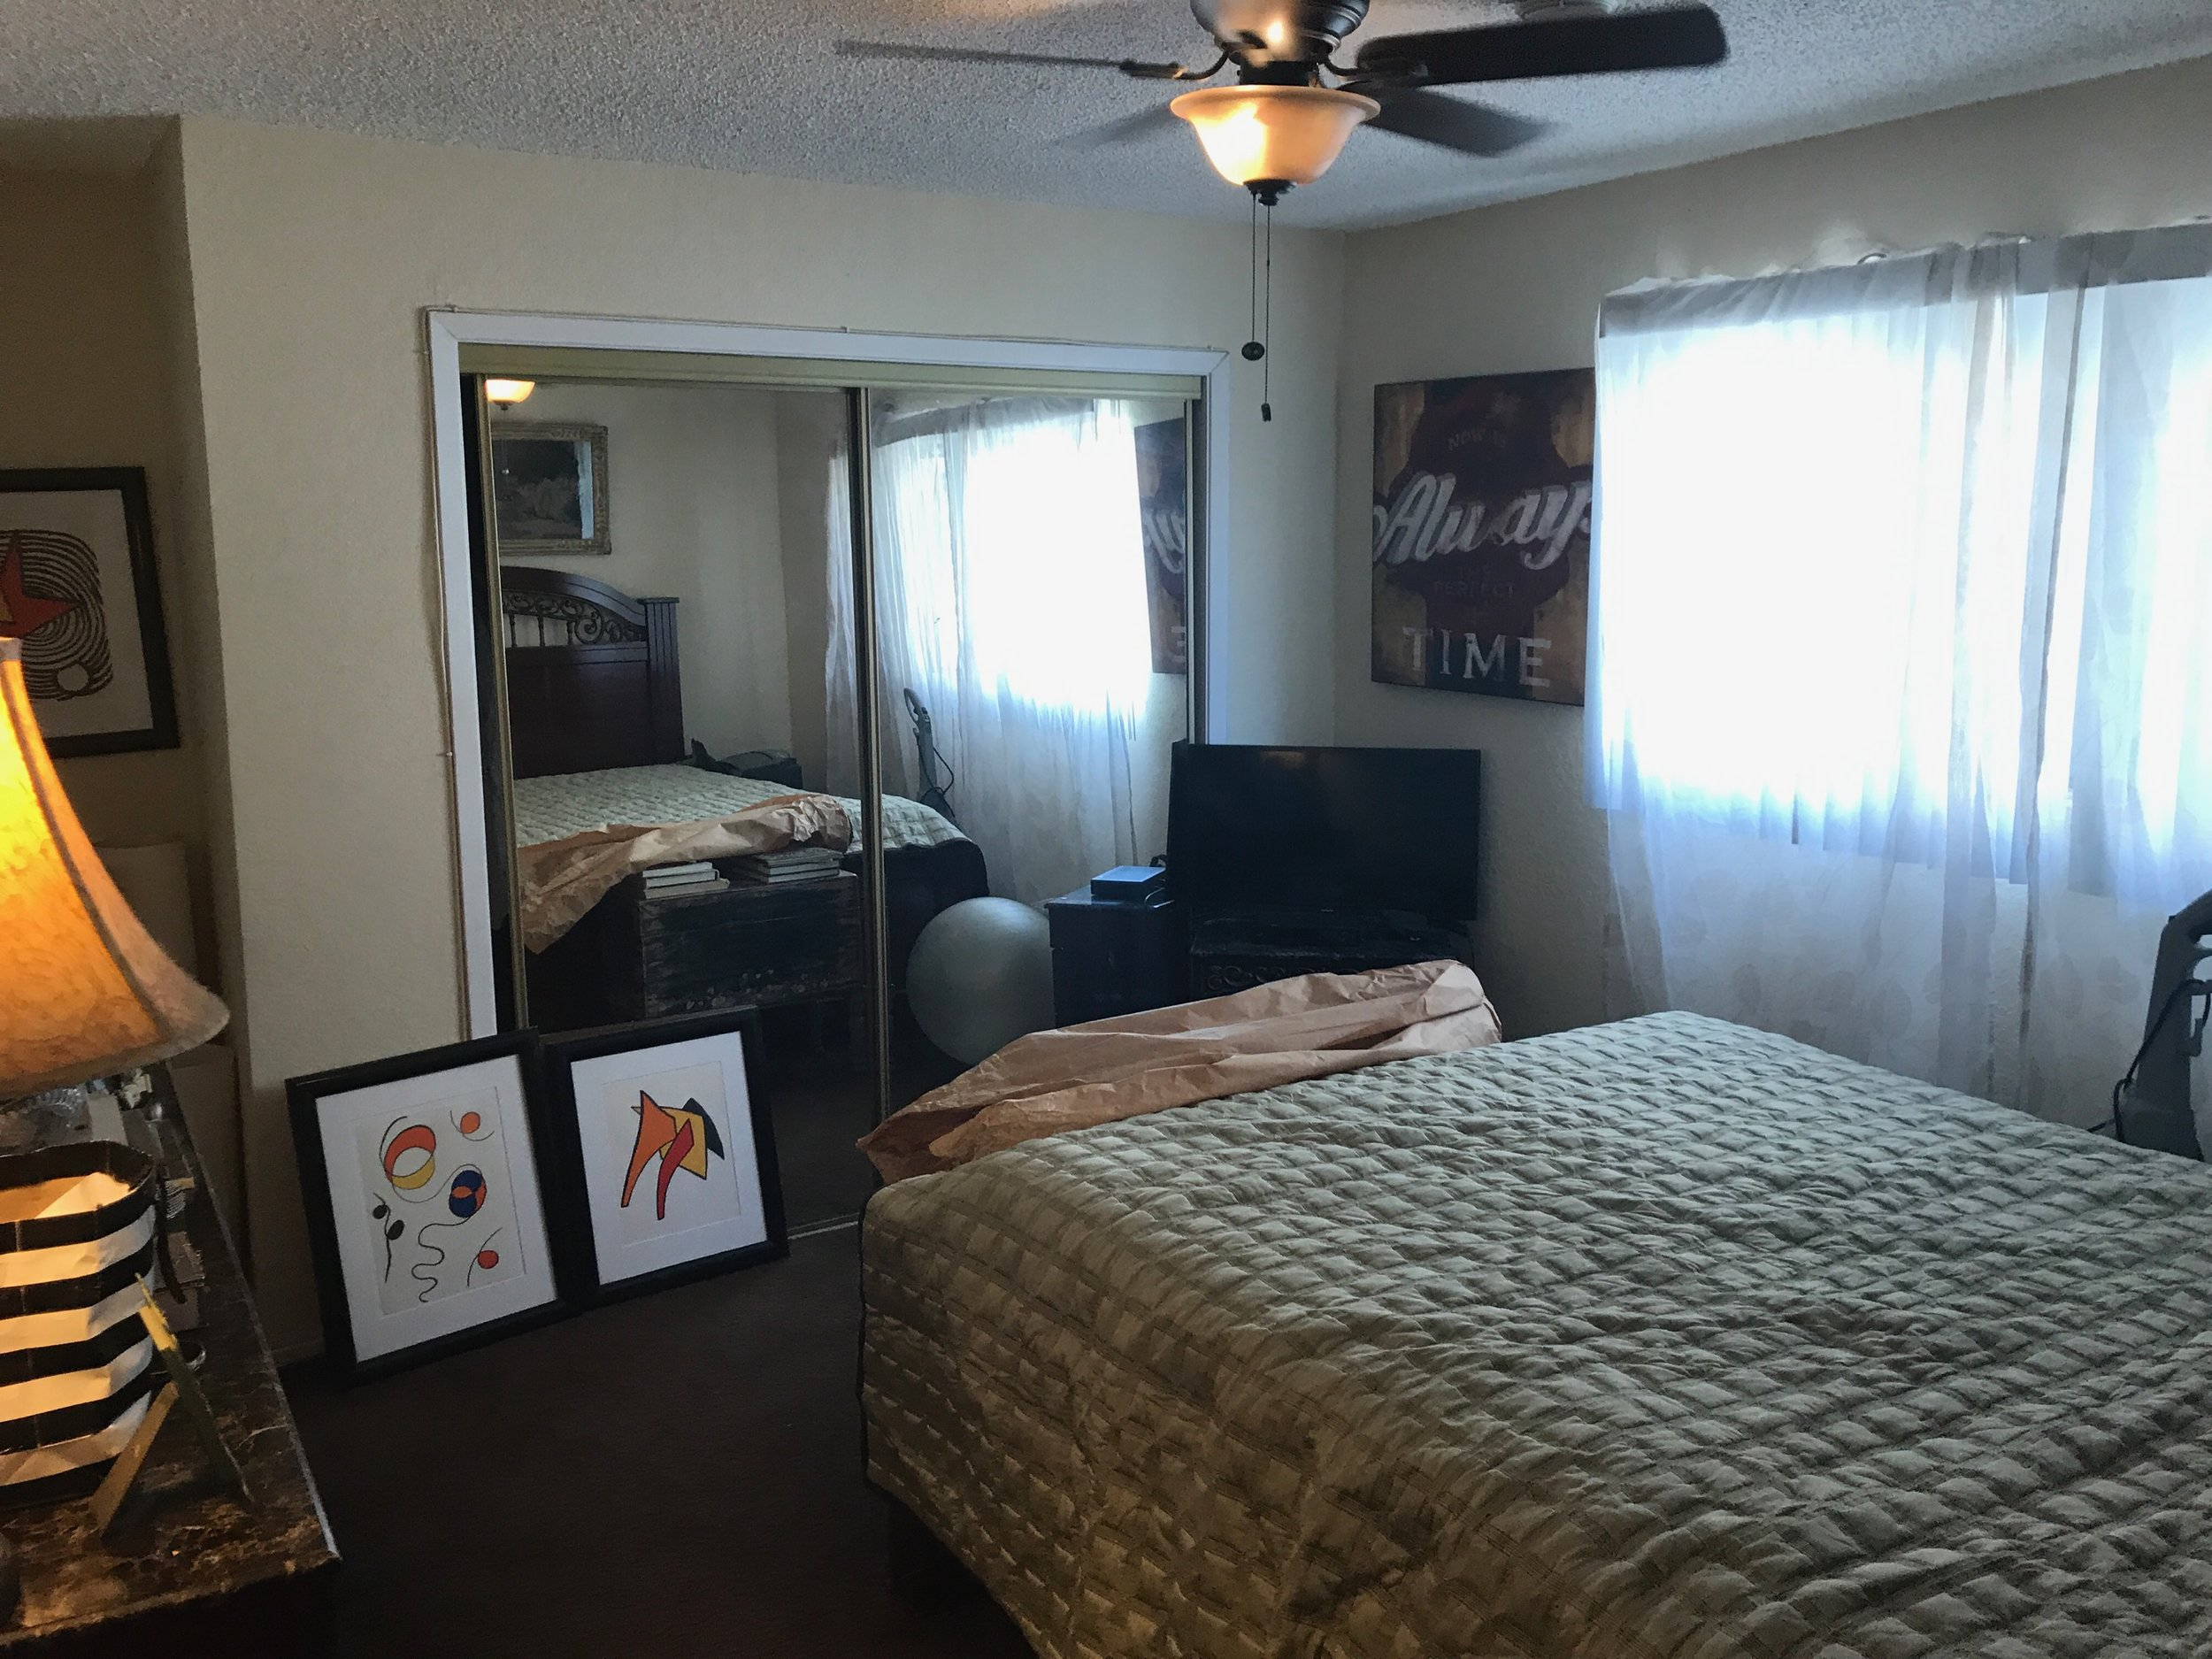 Sell your Silver Lake home - Silver Lake Realtor - Realtor David Bramante IMG_3017.JPG.jpeg